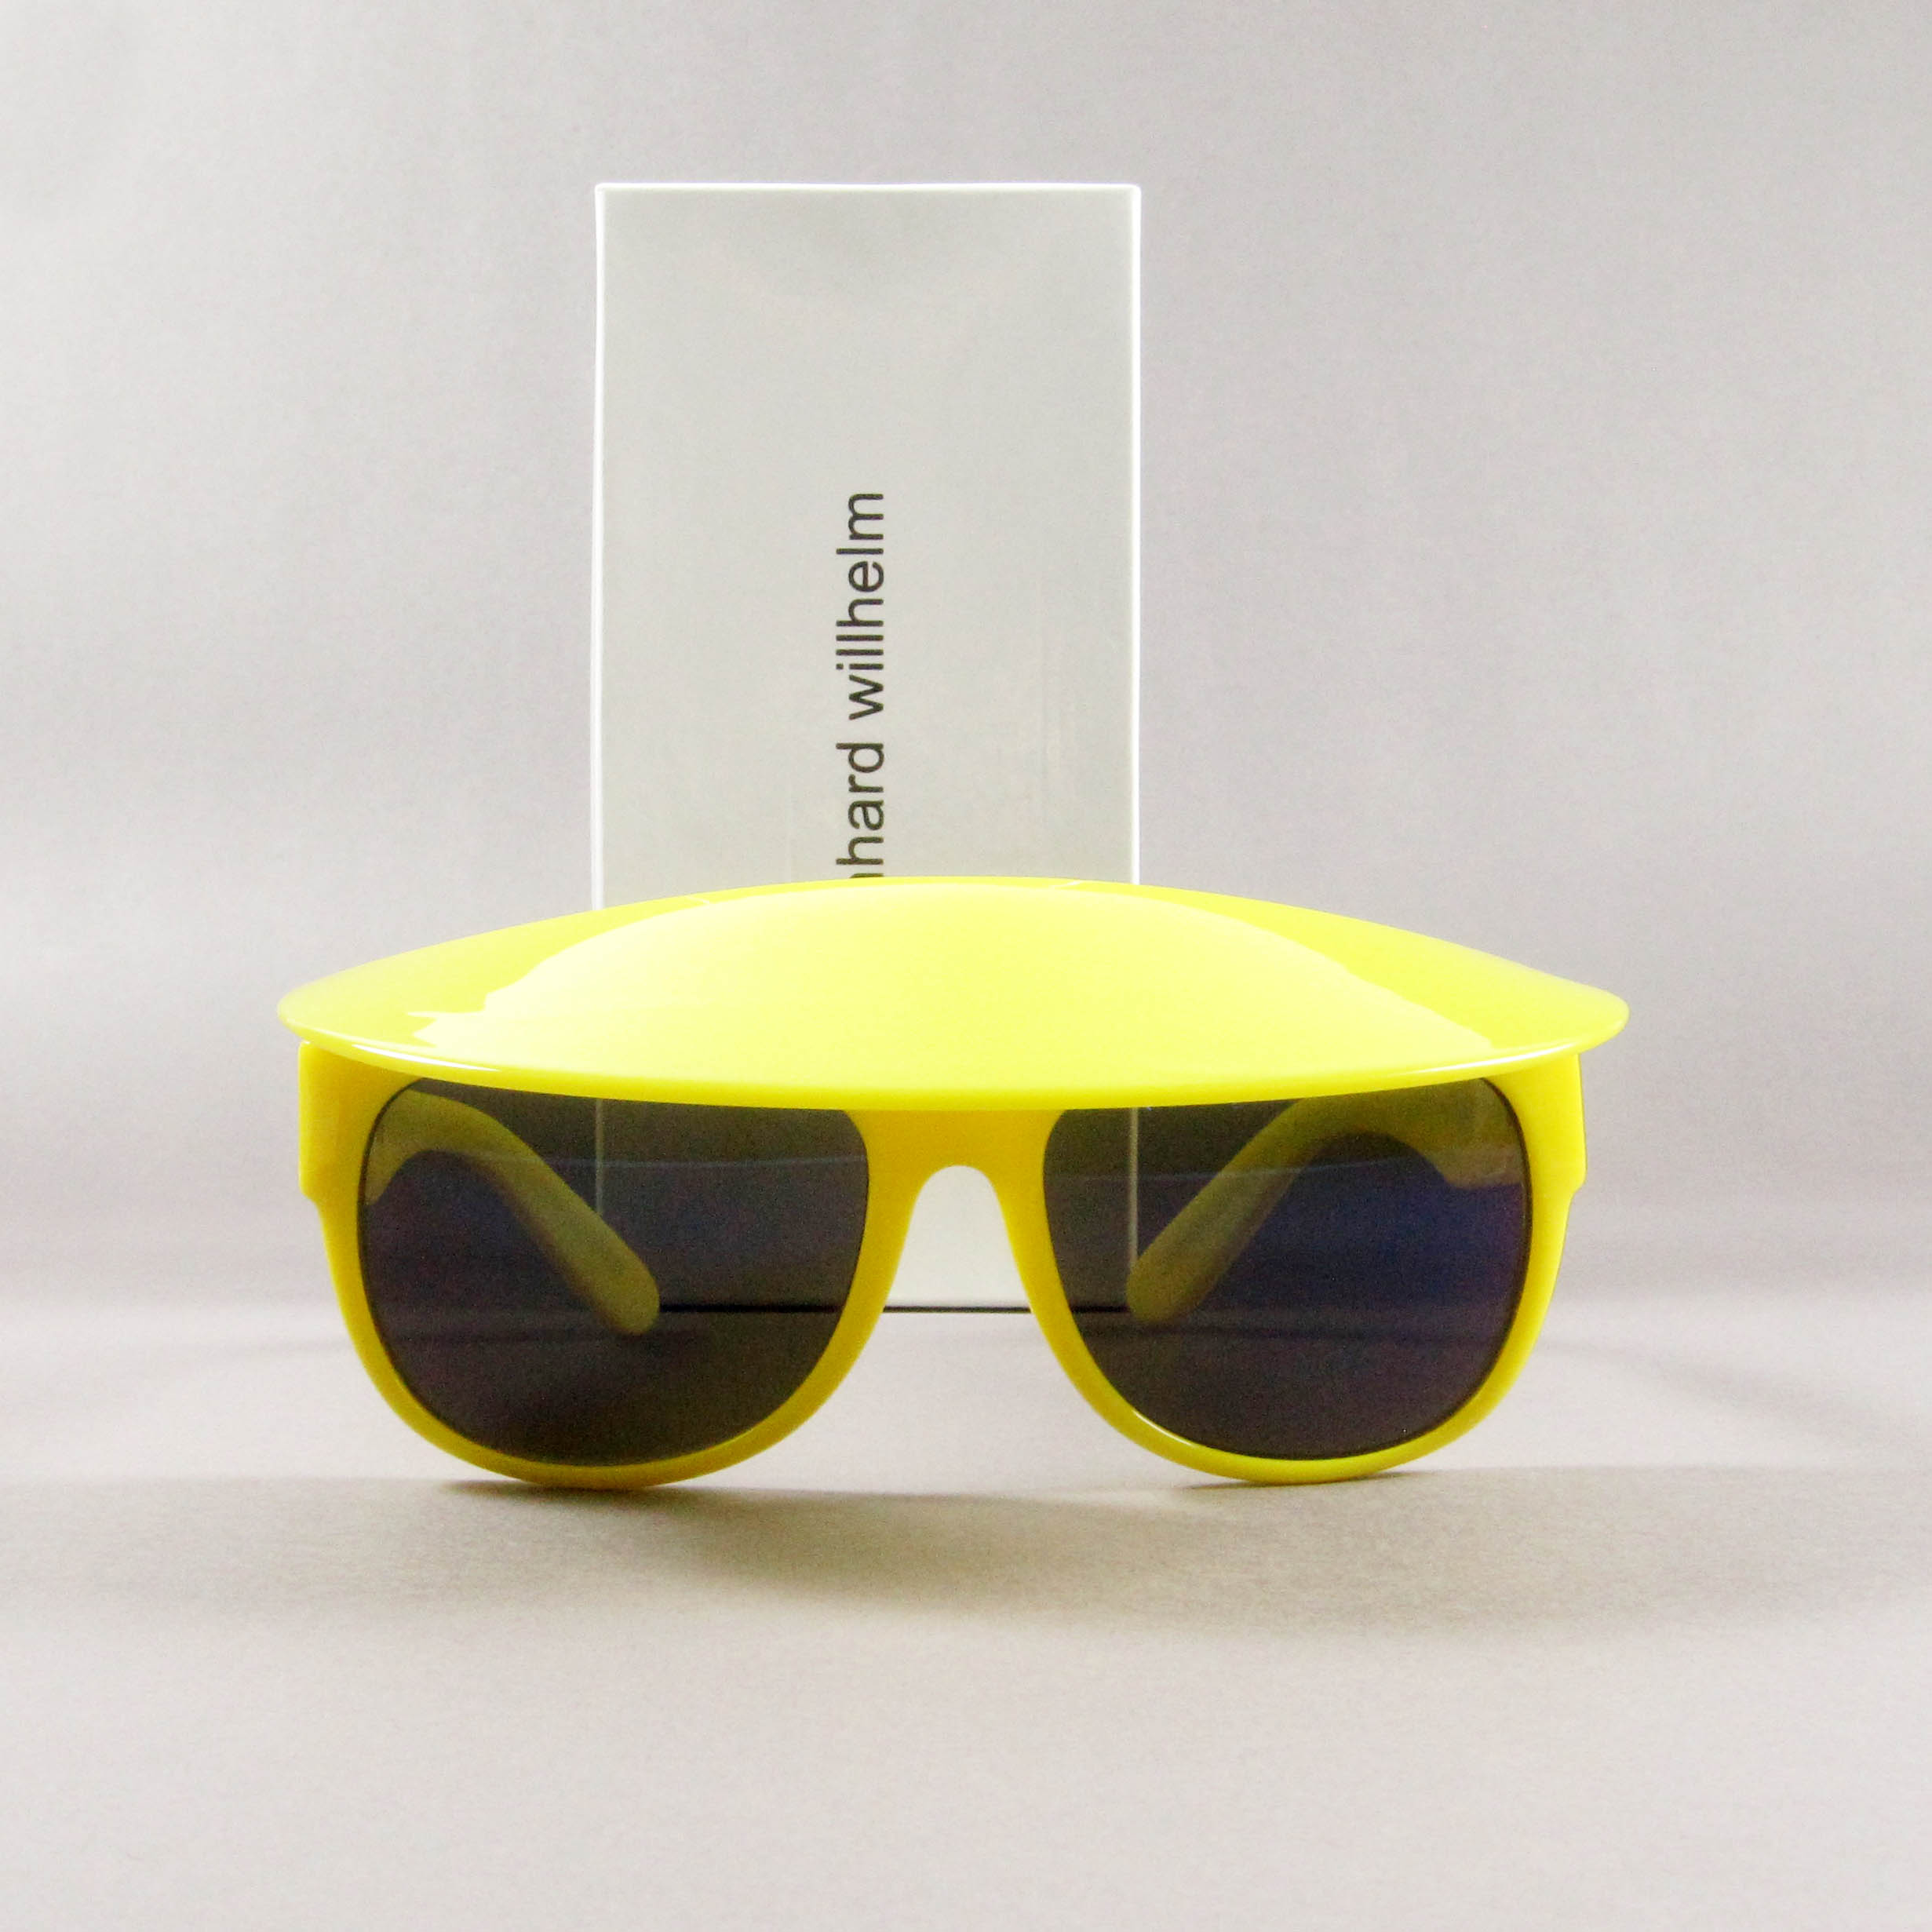 05a8584b015 Bernhard Willhelm × Linda Farrow. Linda Farrow x Bernhard Willhelm Visor  Sunglasses Neon Yellow. Size  ONE SIZE